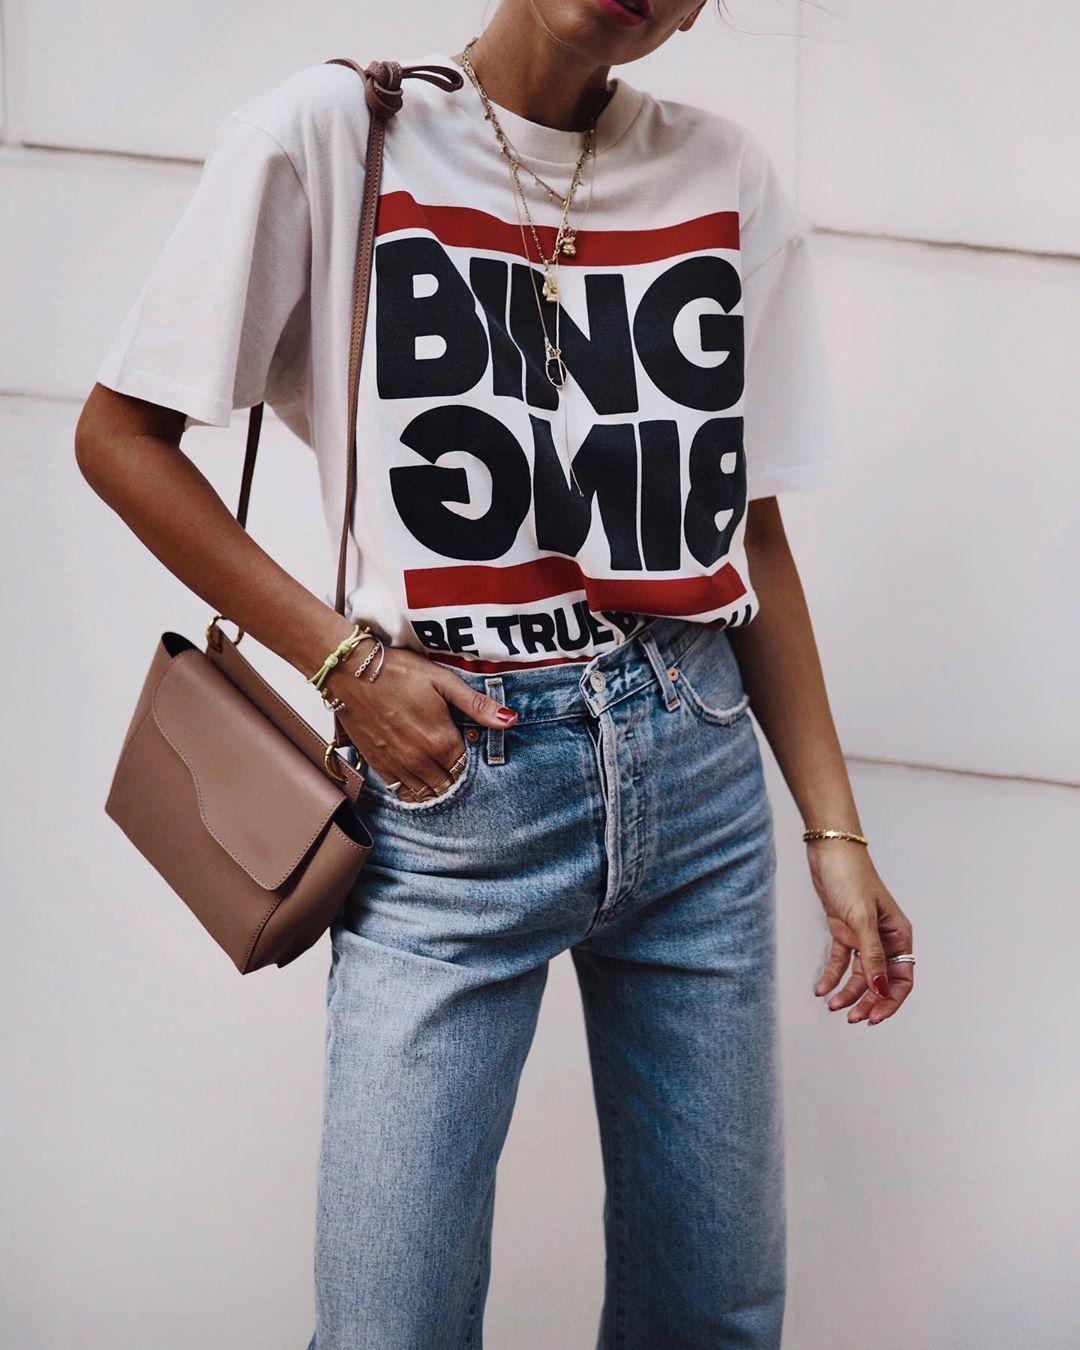 джинсы и футболка фото 11